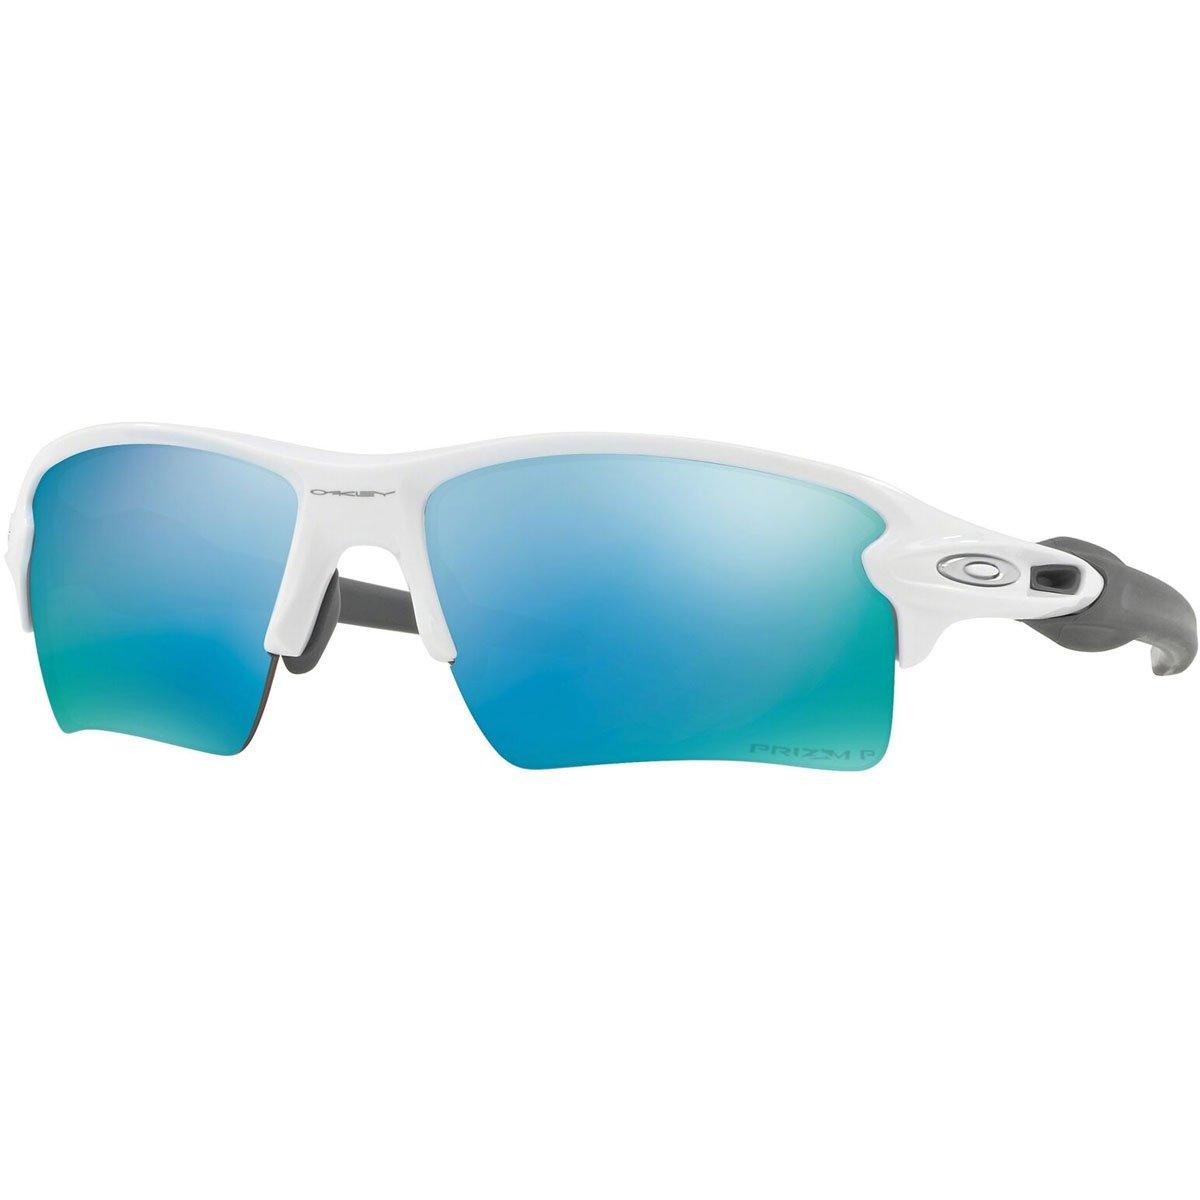 Oakley Men's OO9188 Flak 2.0 XL Rectangular Sunglasses, Polished White/Prizm Deep H2O Polarized, 59 mm by Oakley